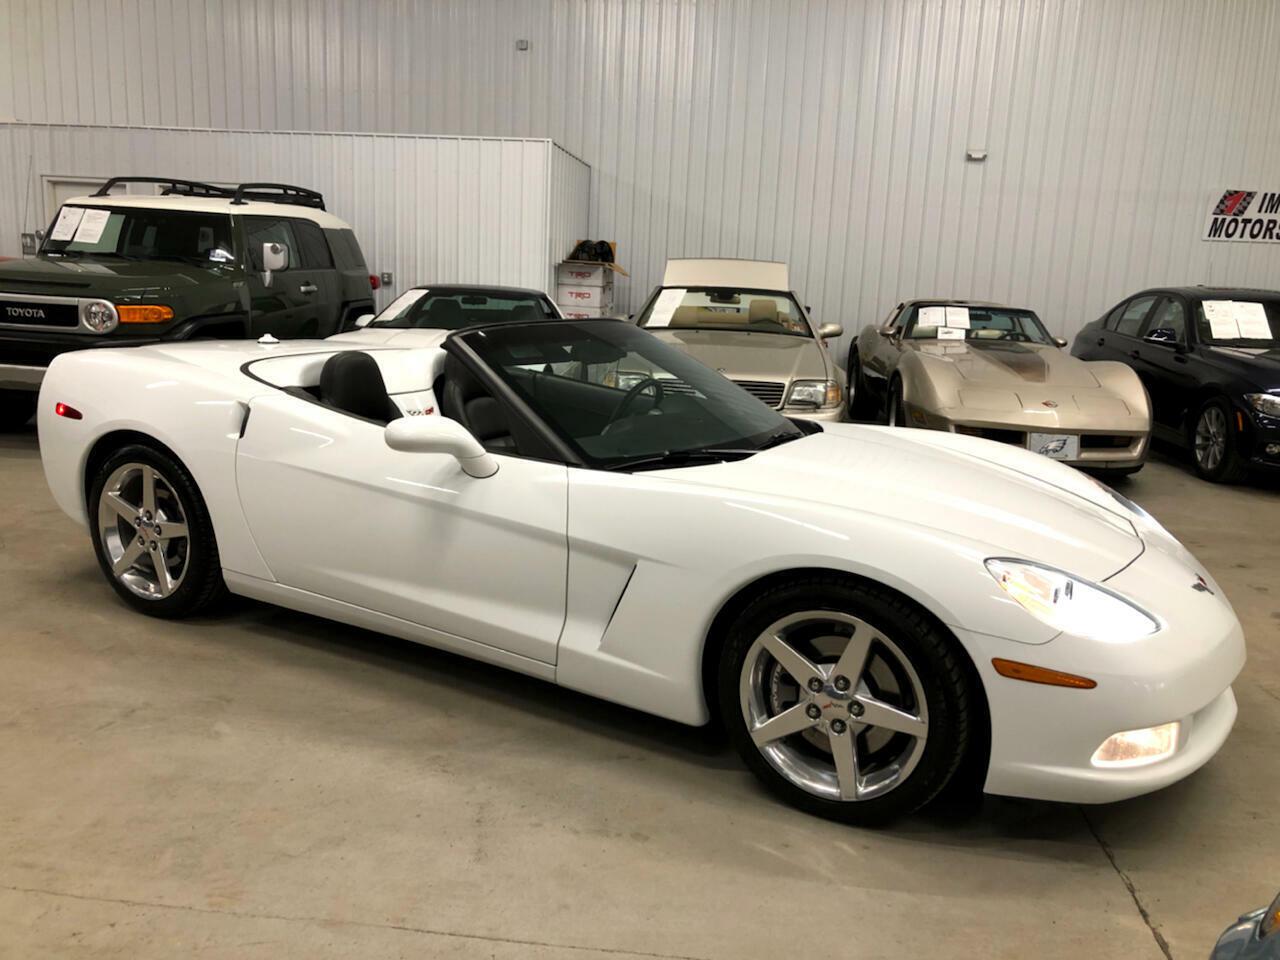 2005 White Chevrolet Corvette Convertible  | C6 Corvette Photo 3